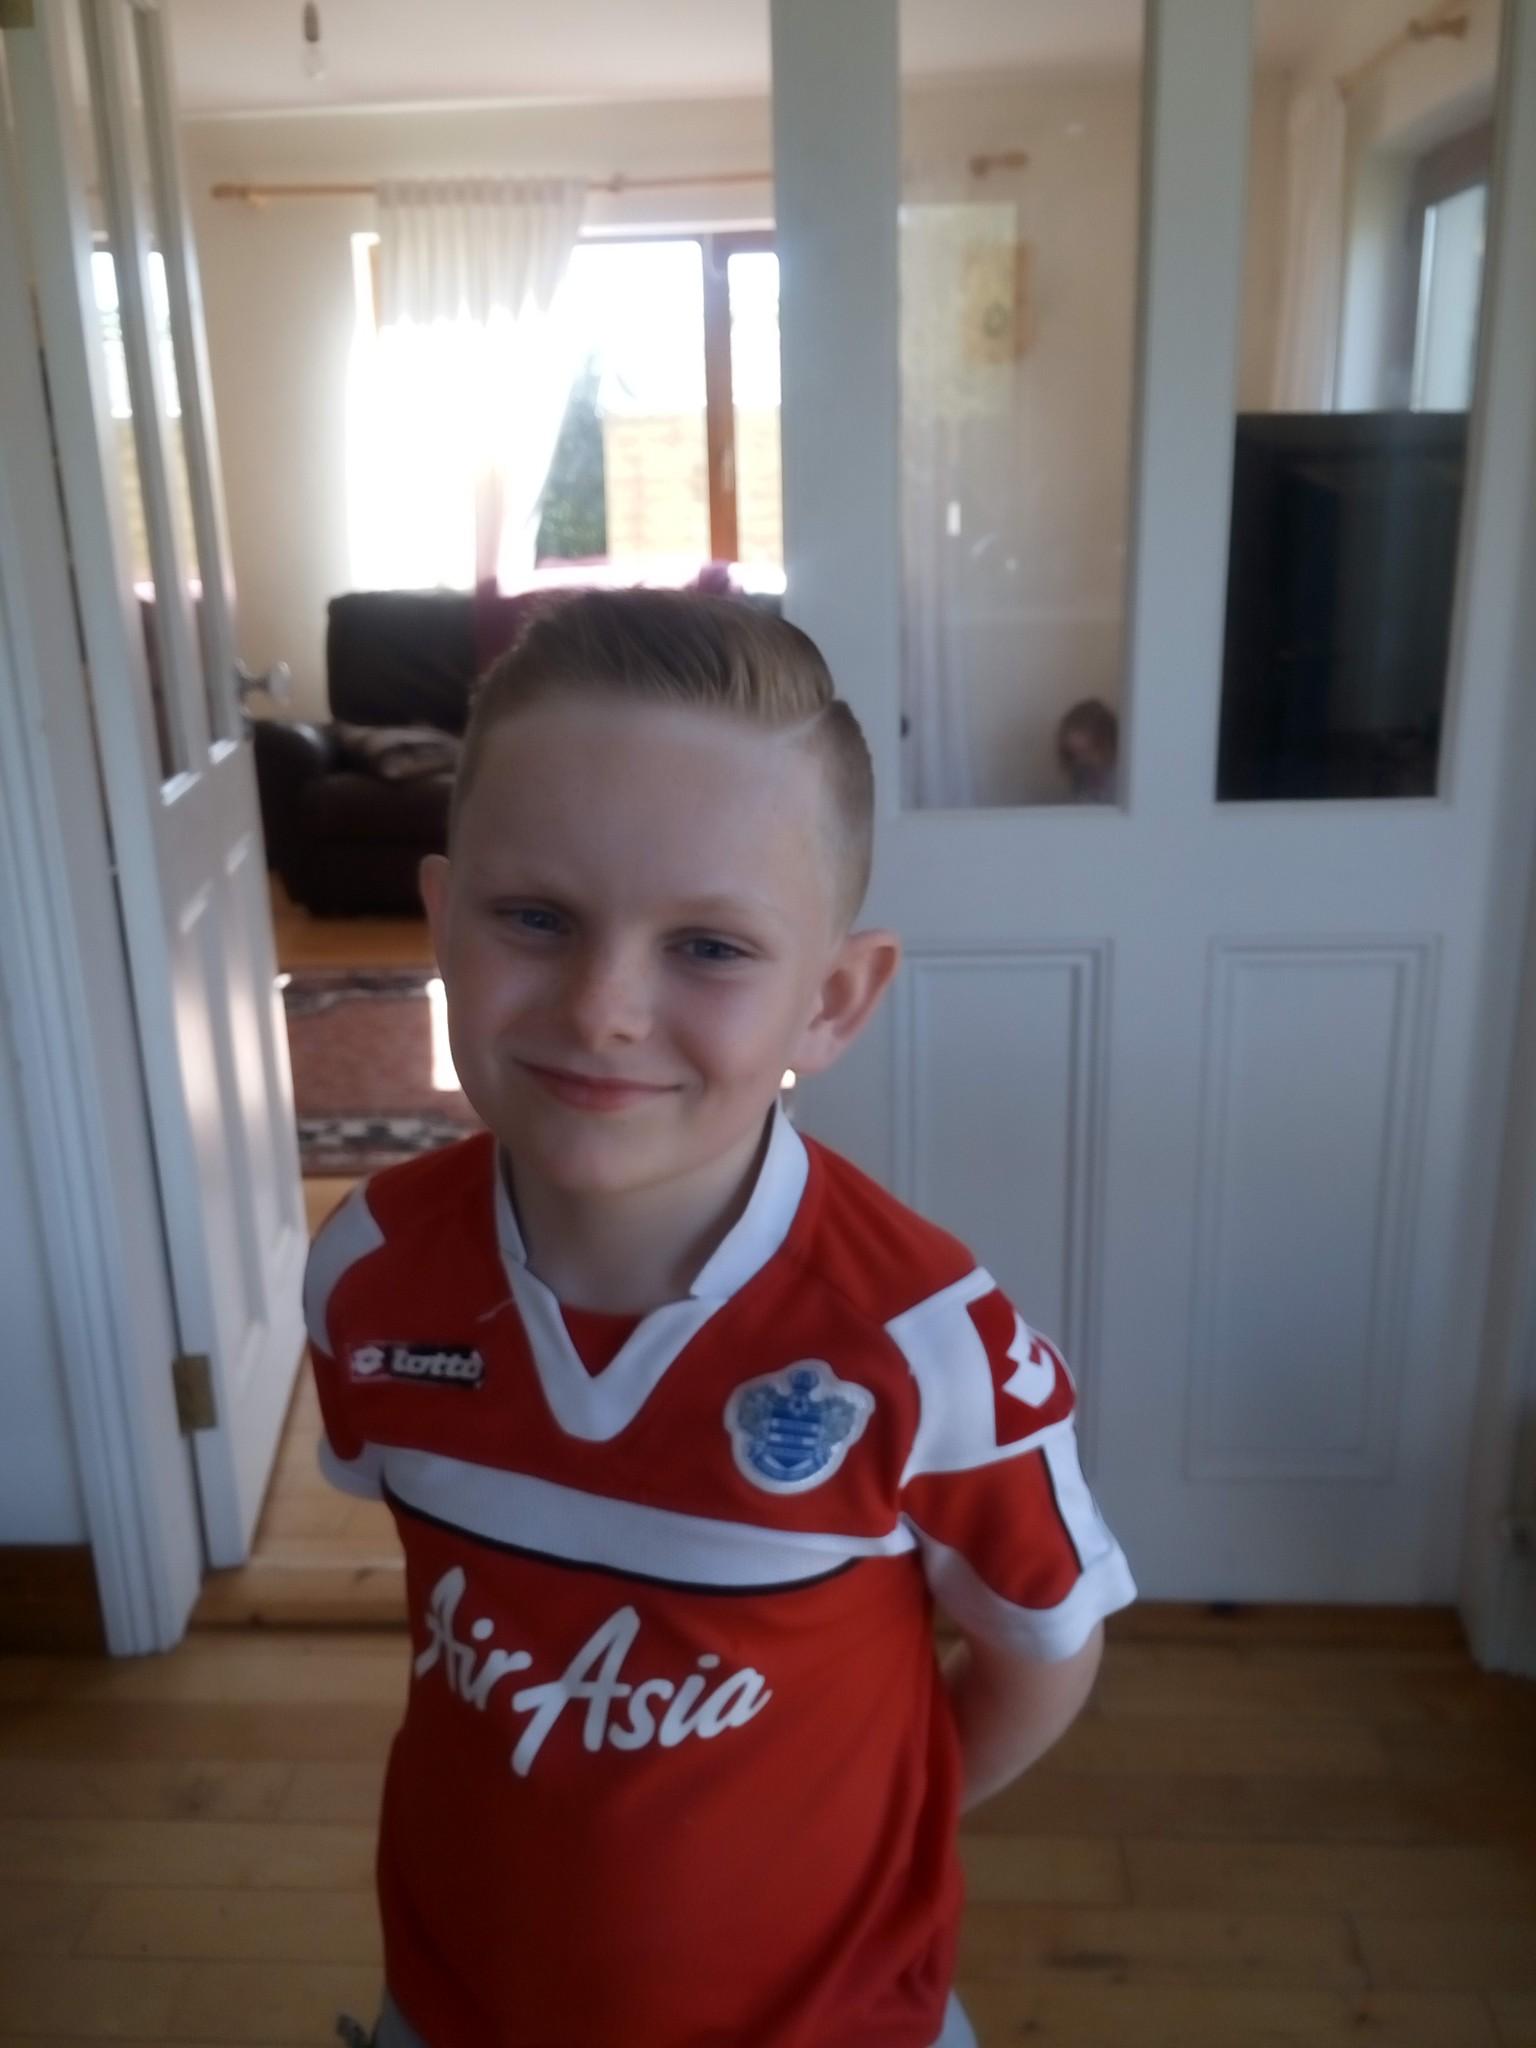 boy wearing red football shirt